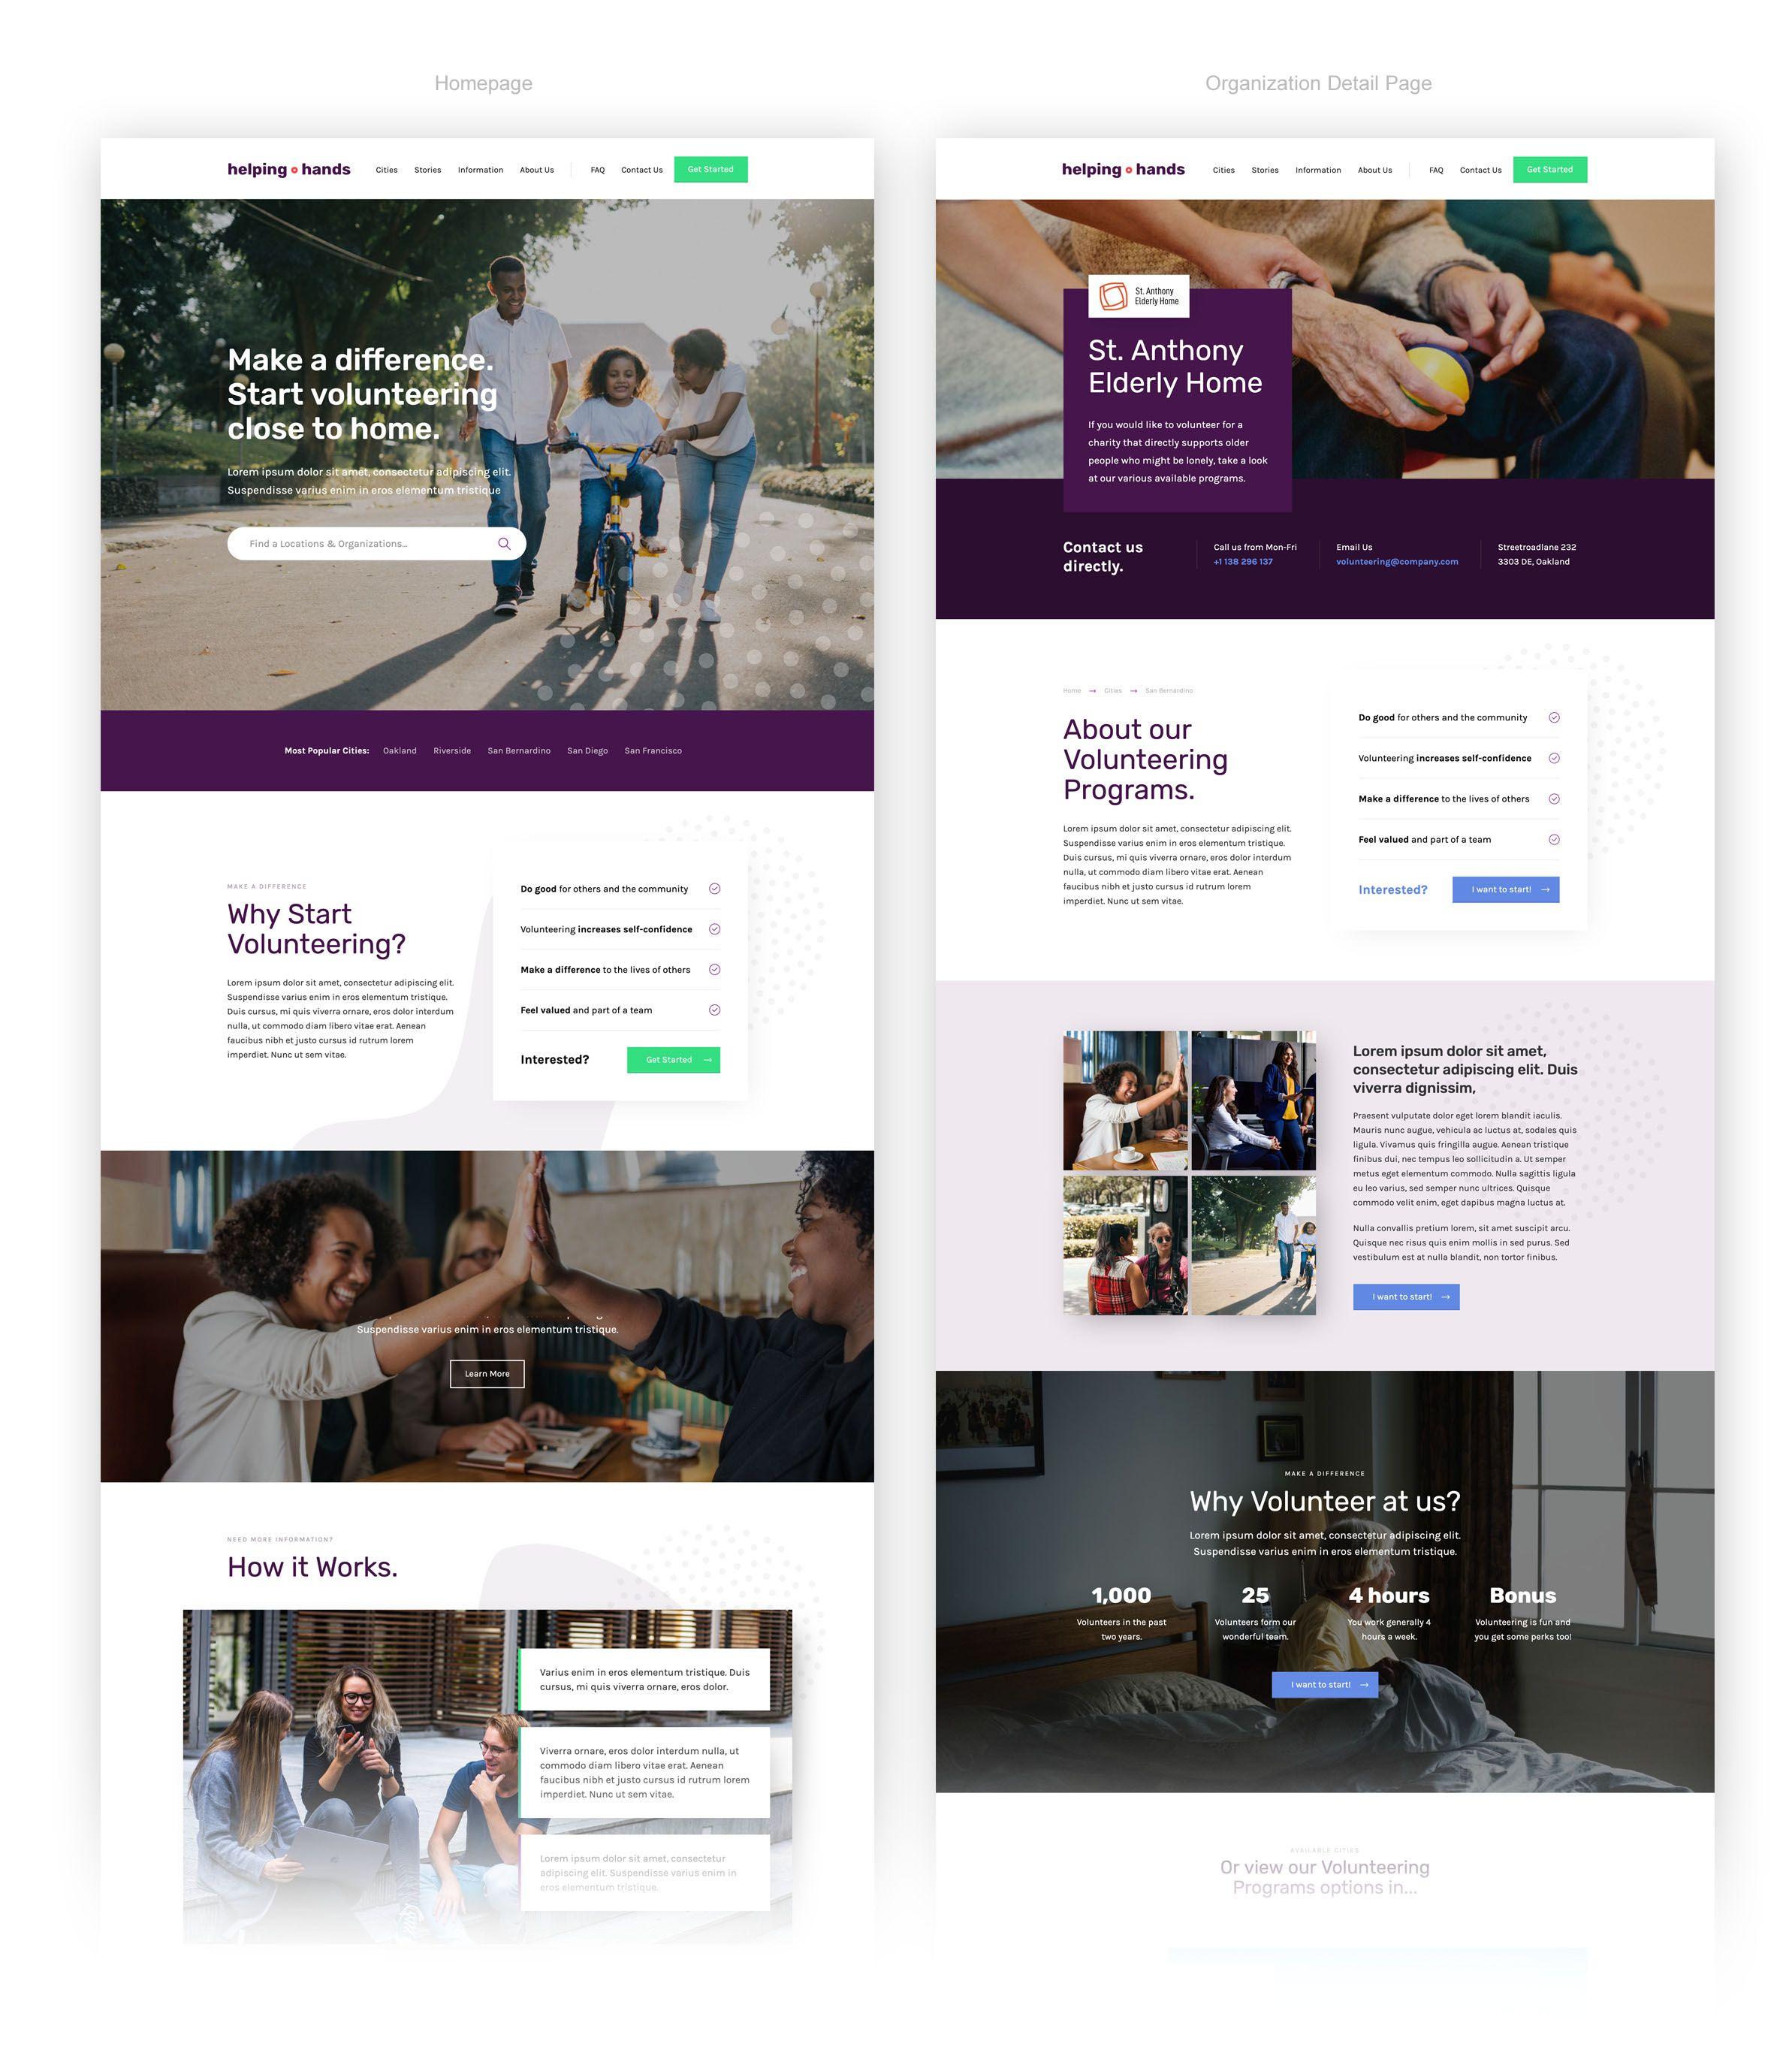 Helpinghands Nonprofit Html5 Responsive Website Template Responsive Website Template Website Template Web Design Tools